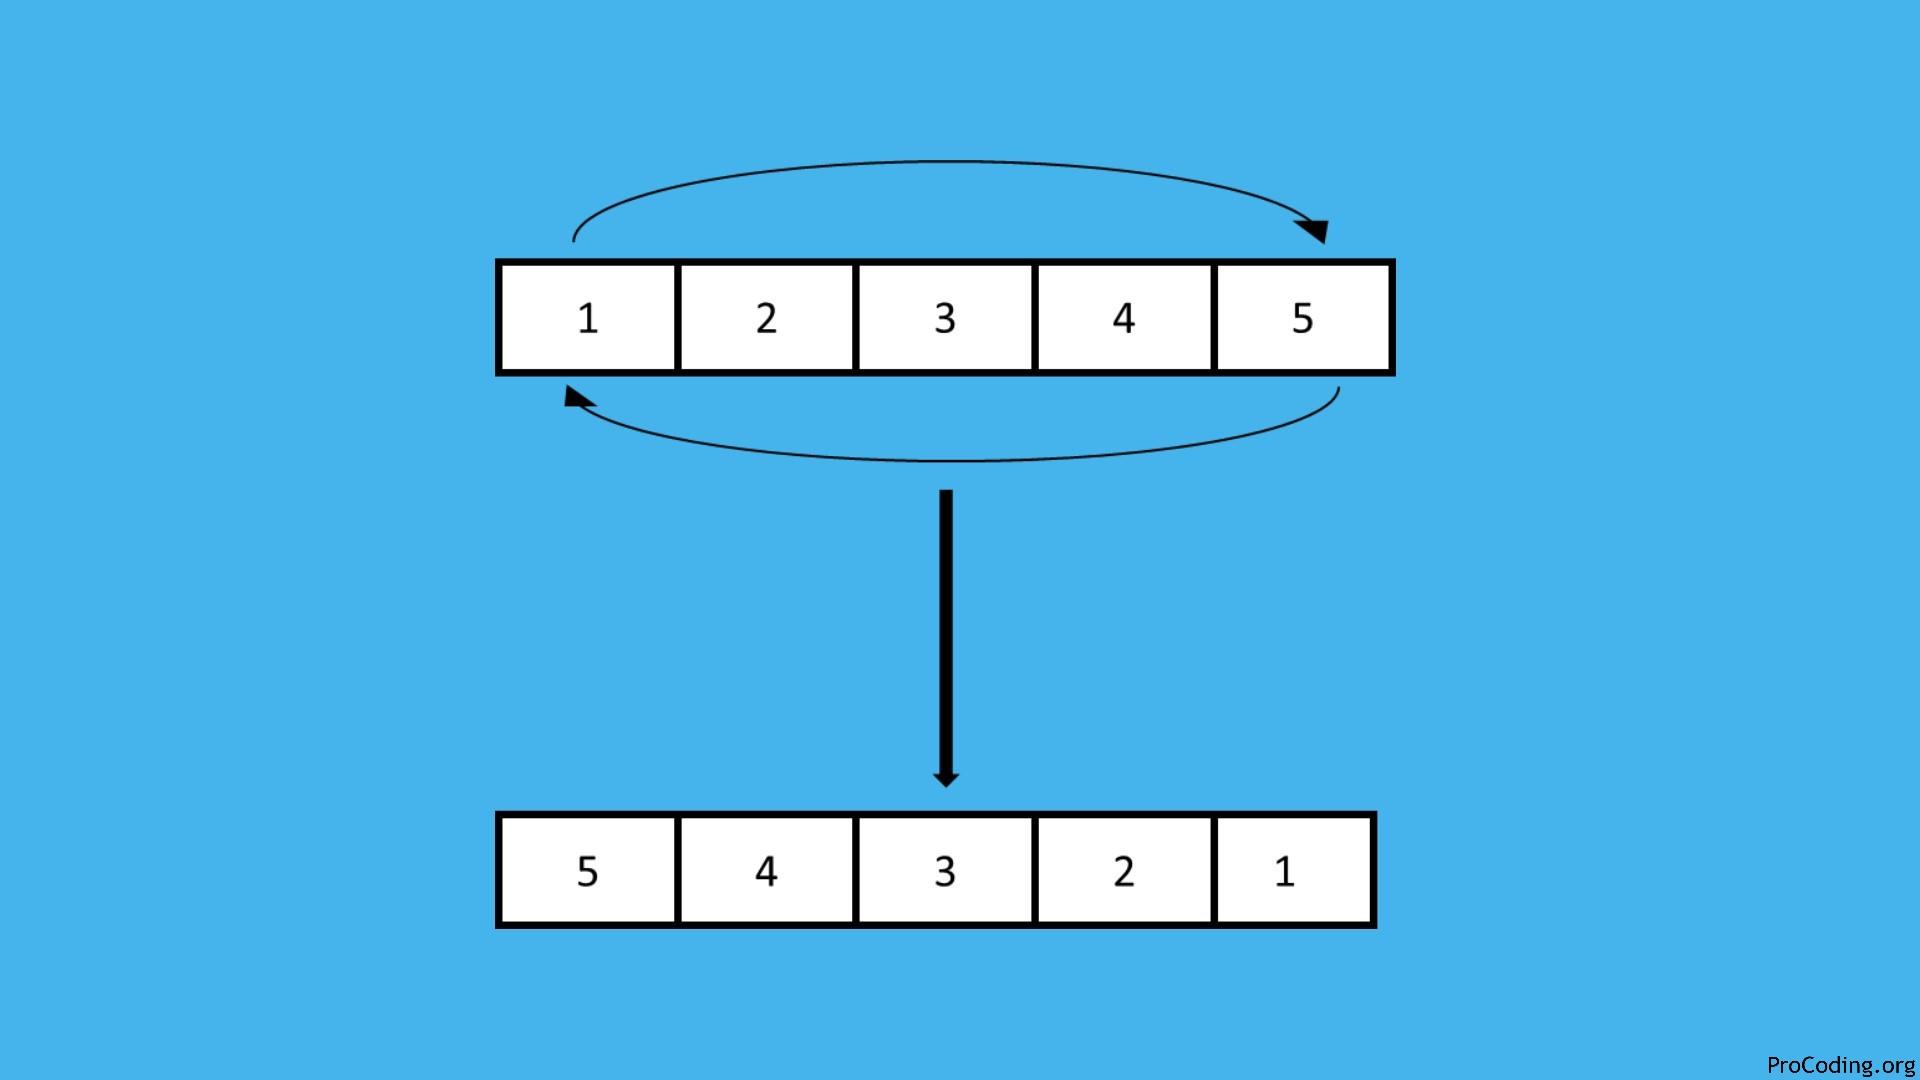 reverse elements of an array